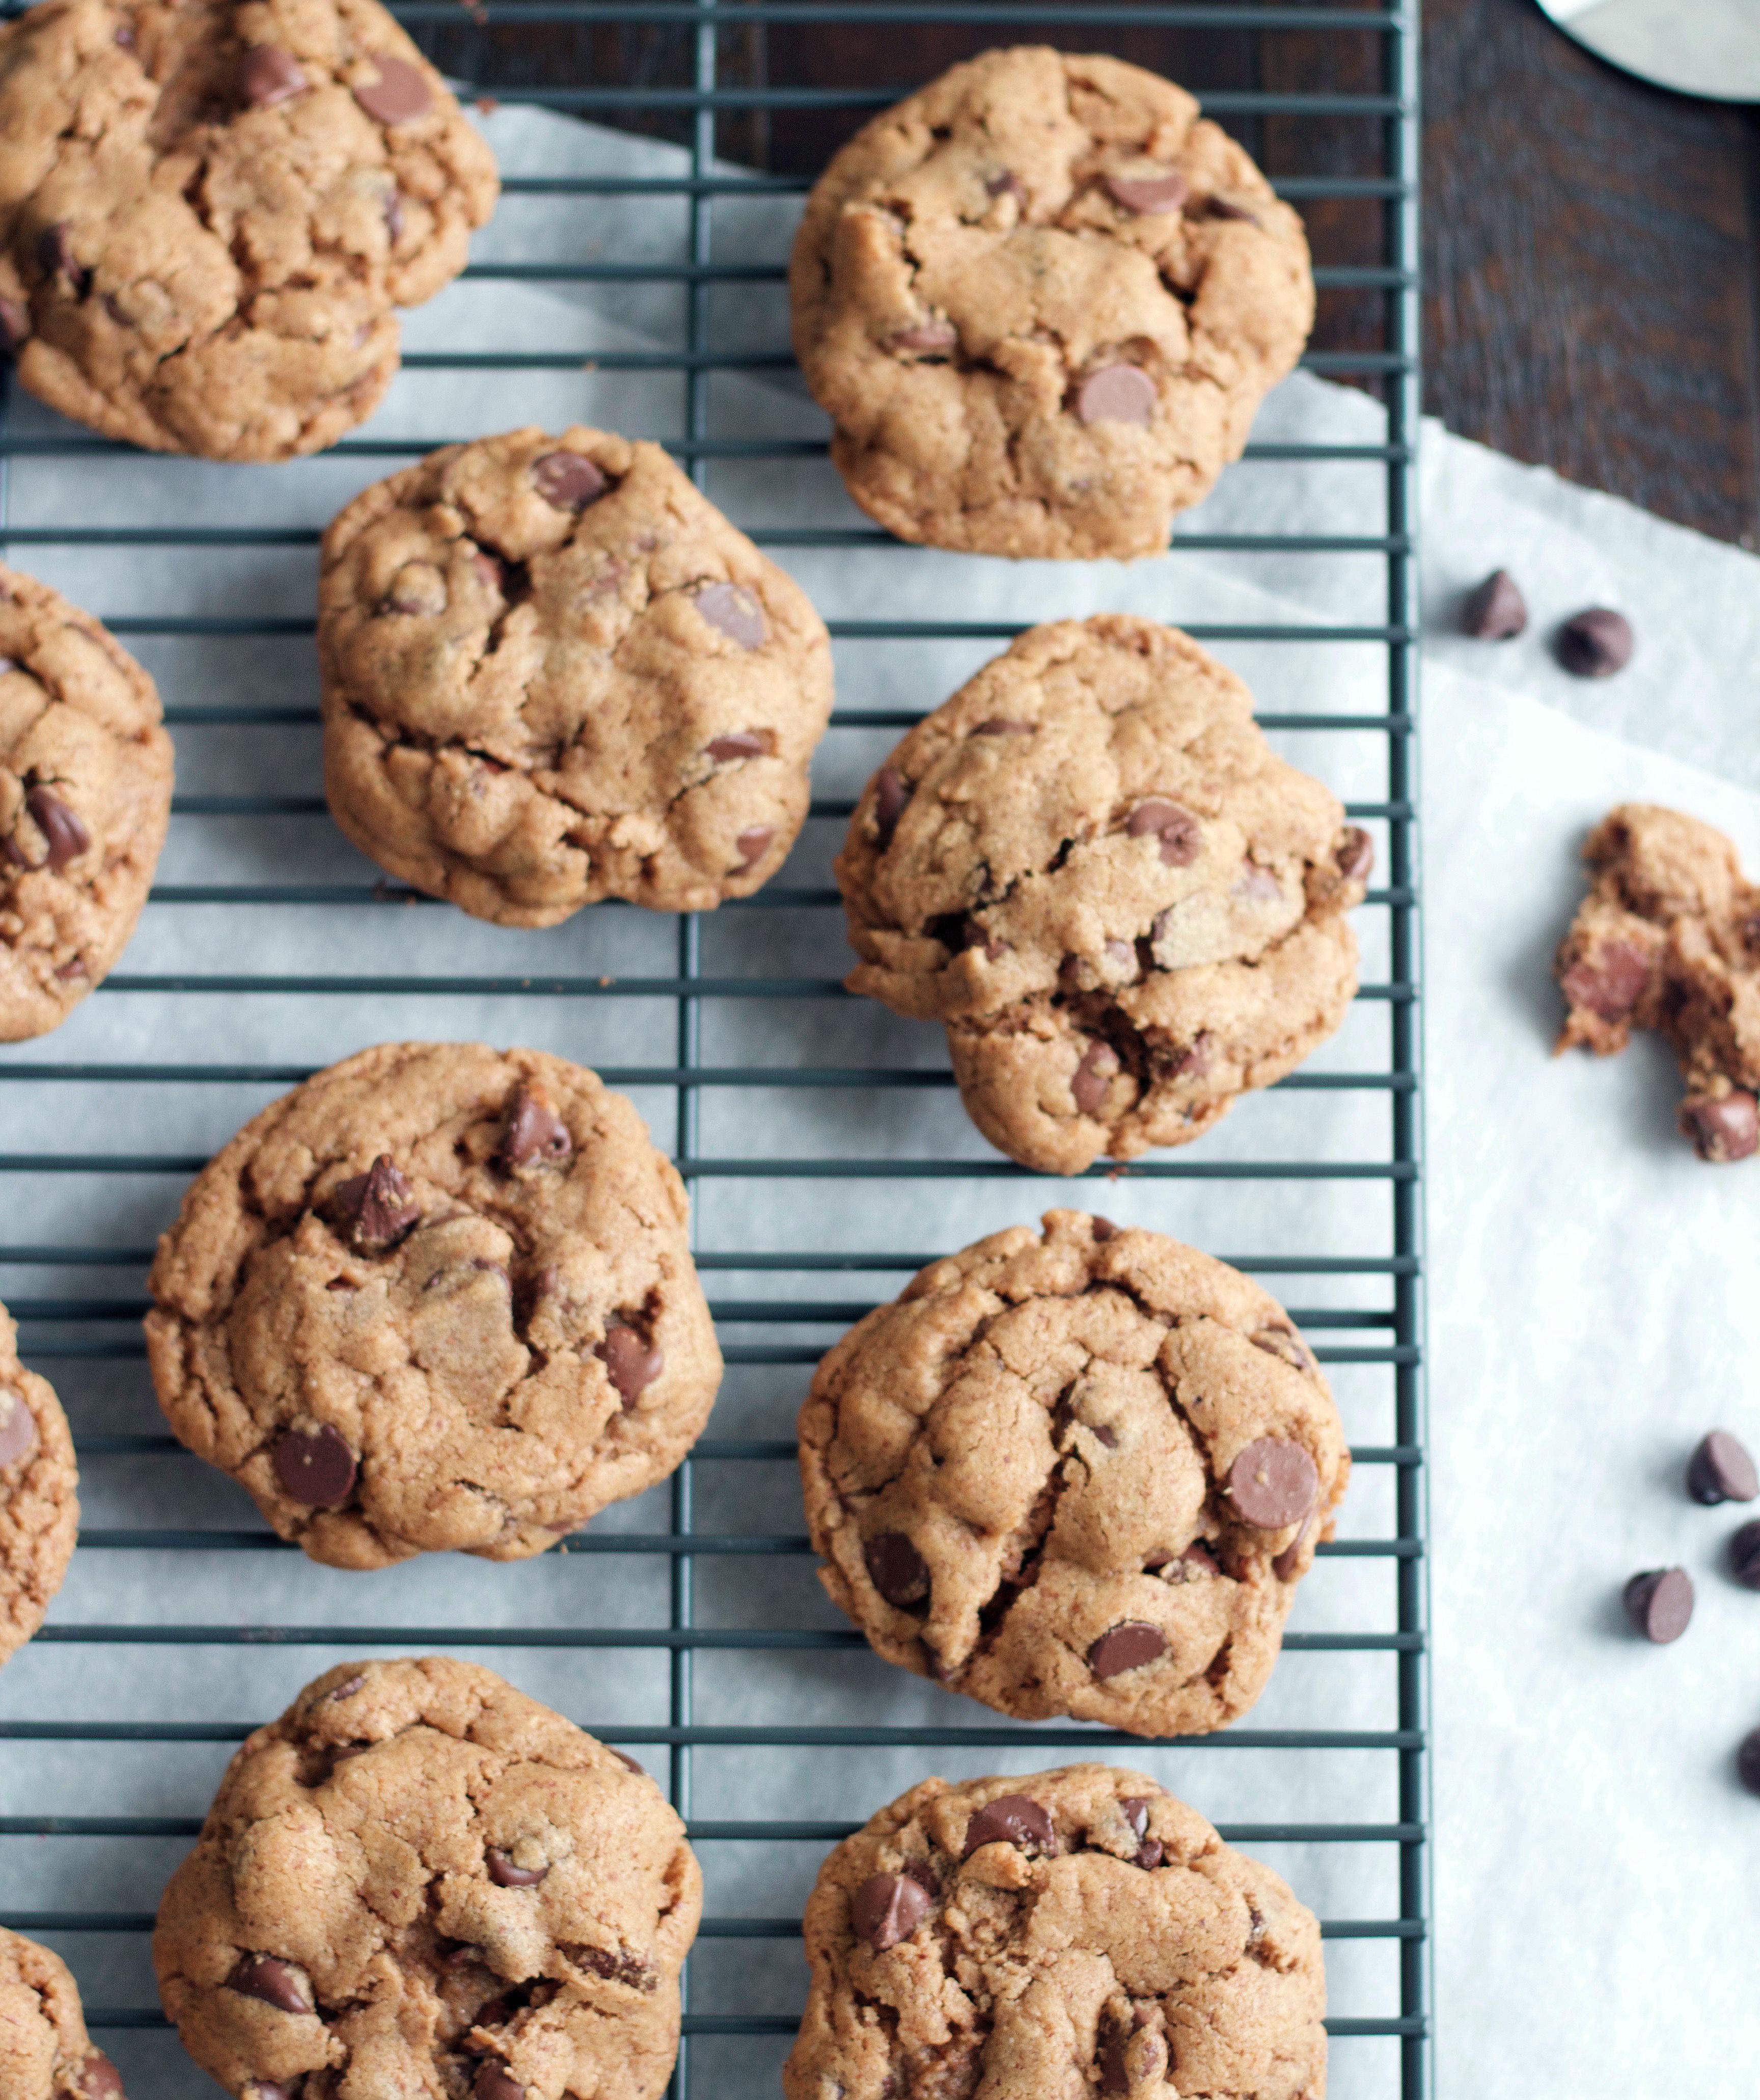 Almond Butter Chocolate Chip Cookies - 5BoysBaker